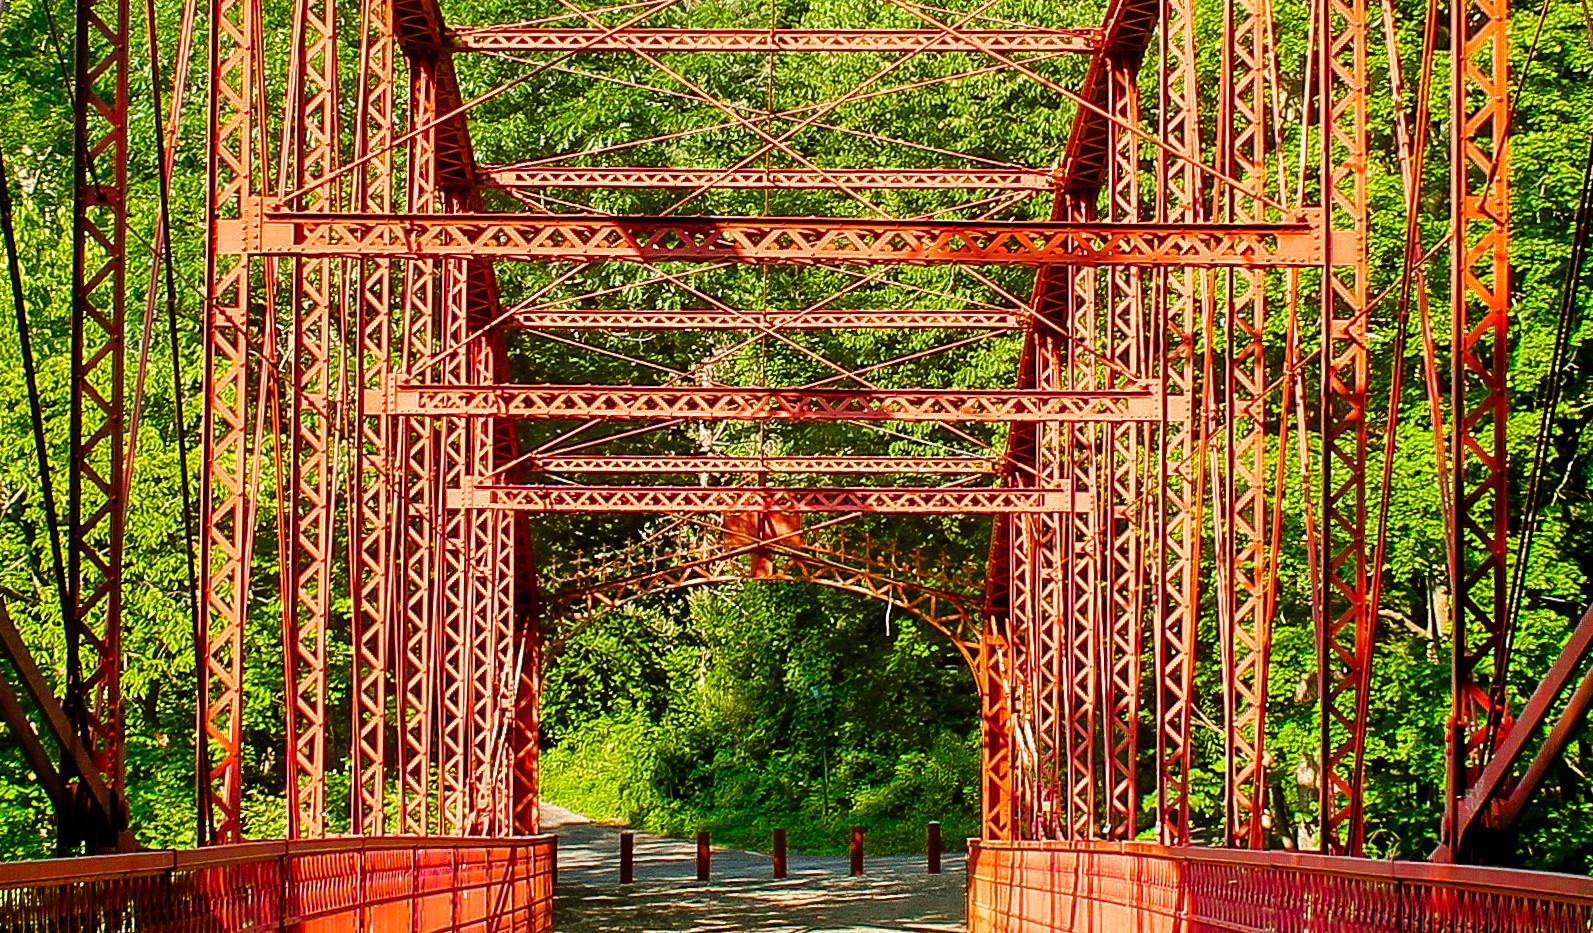 Lover's Leap Bridge